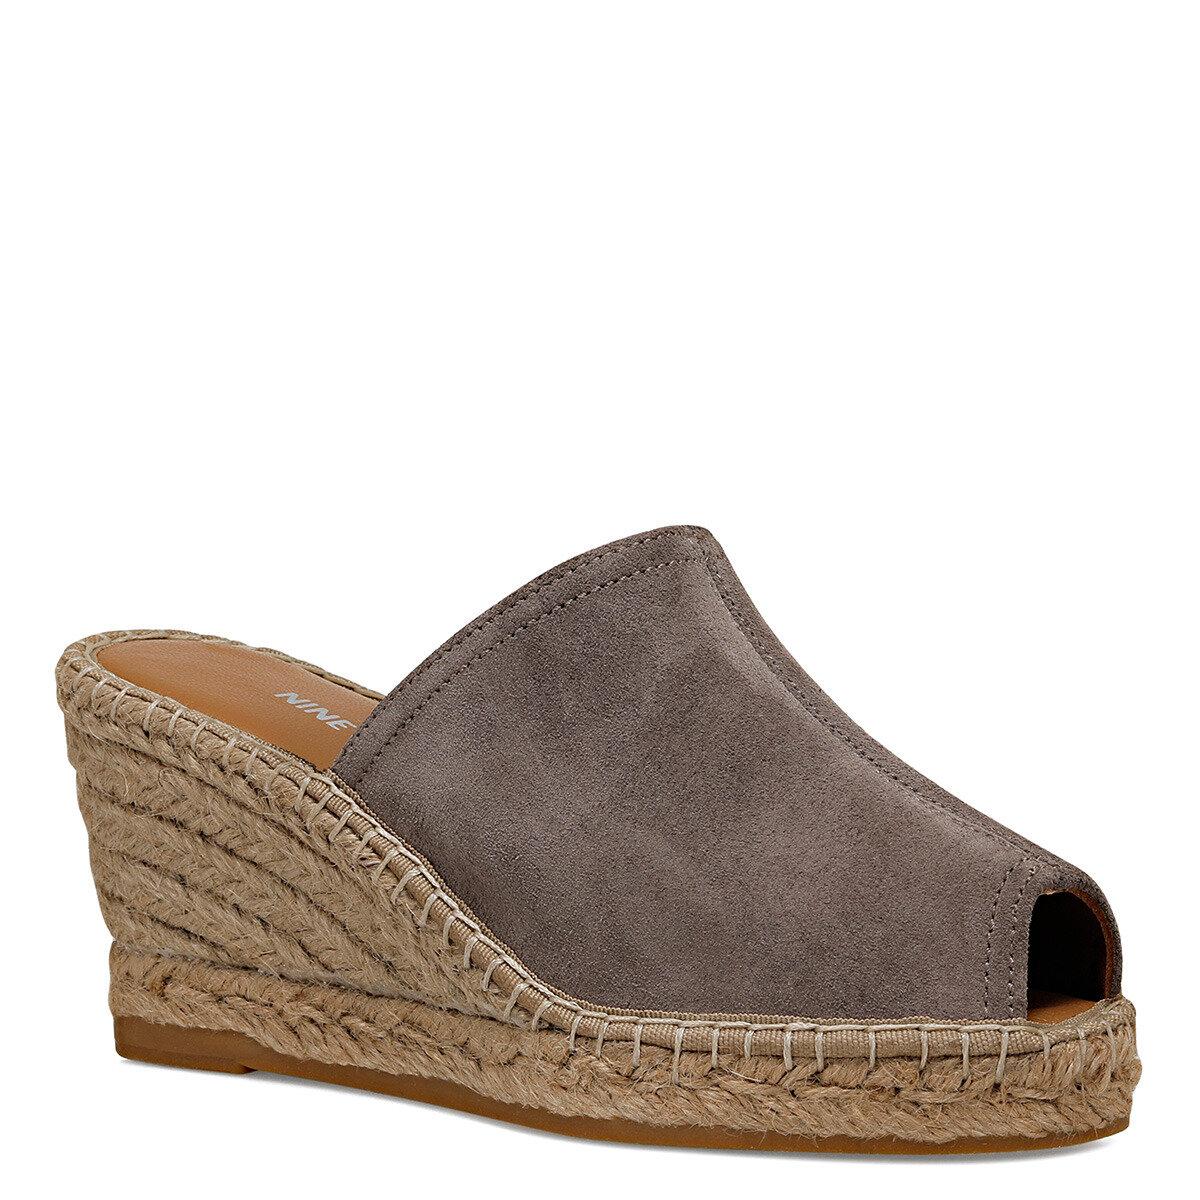 KAUFFMAN2 Vizon Kadın Dolgu Topuklu Sandalet